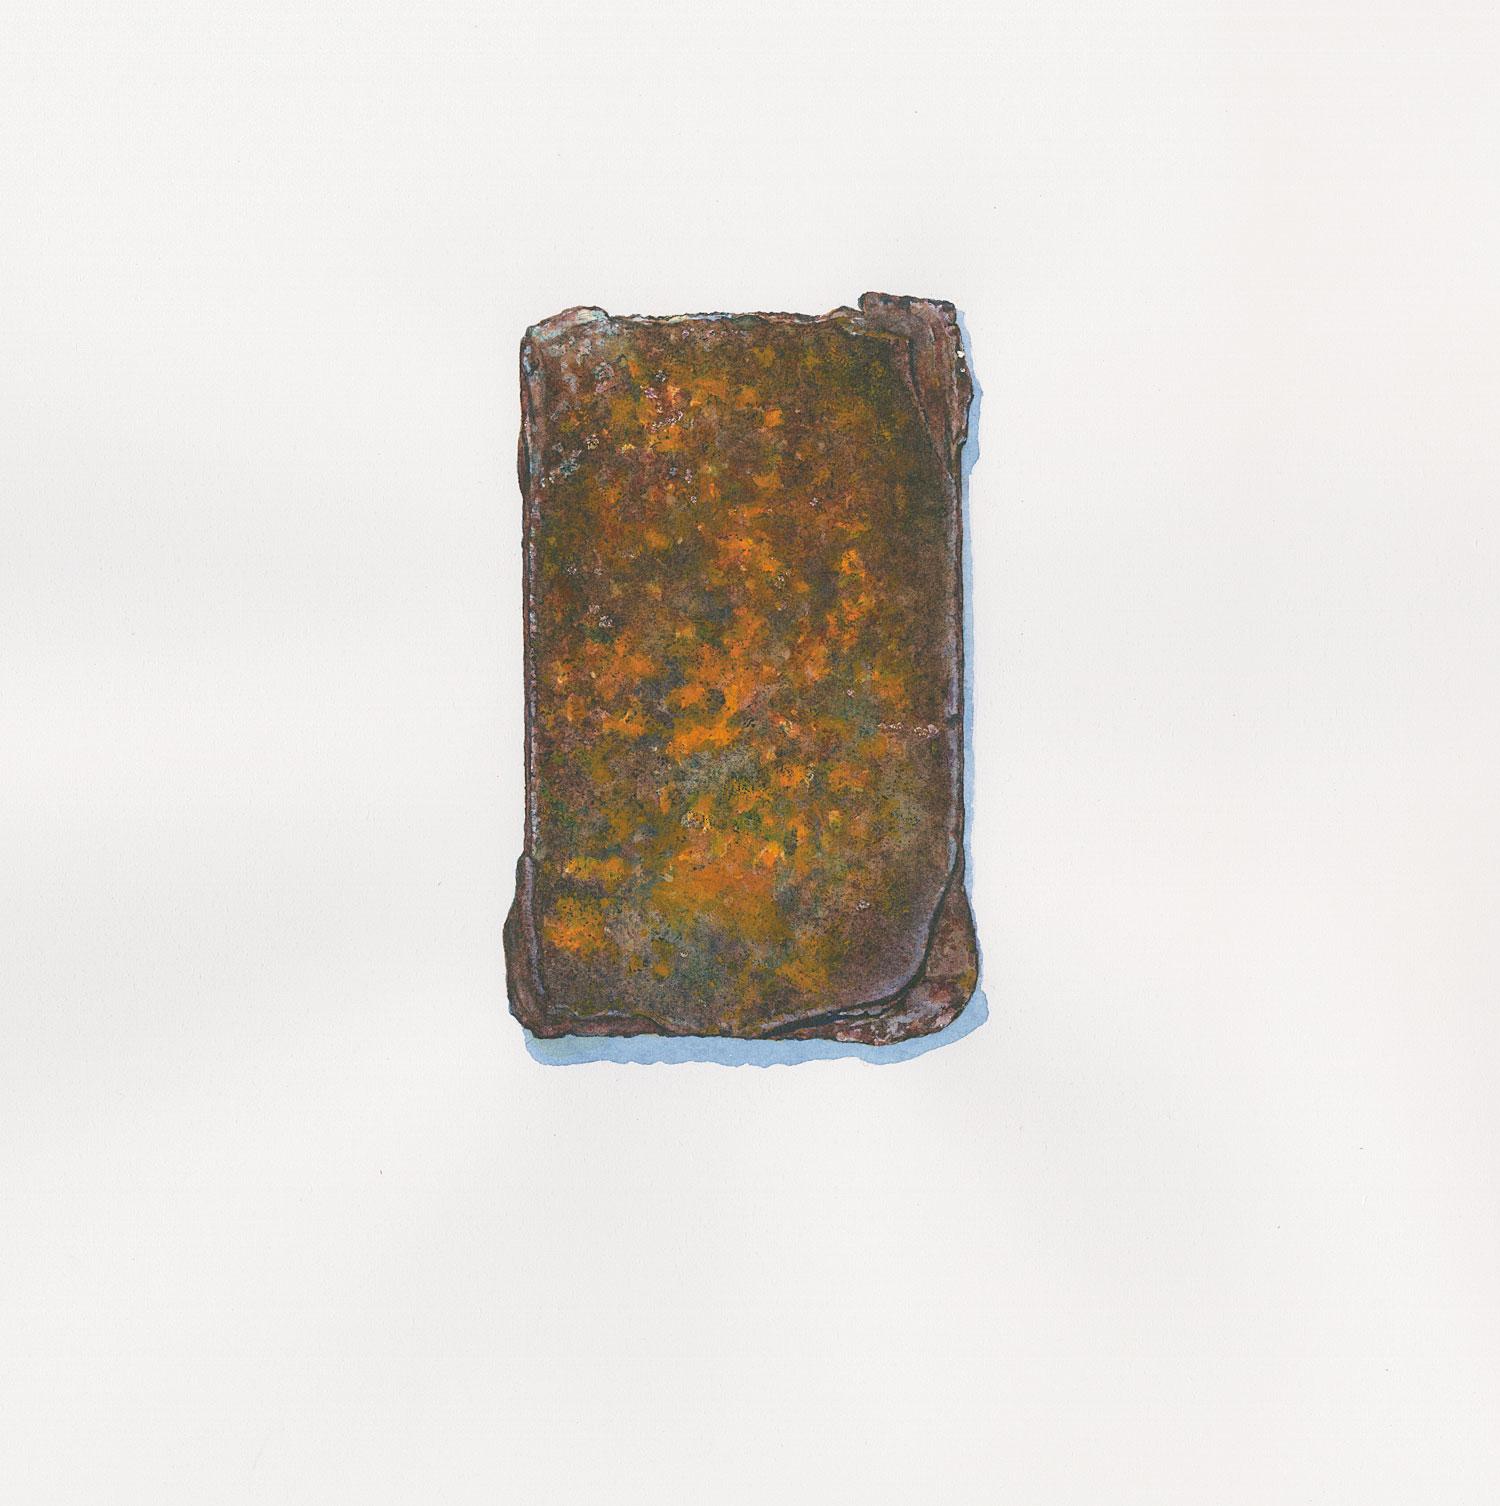 Unknown Metal Object